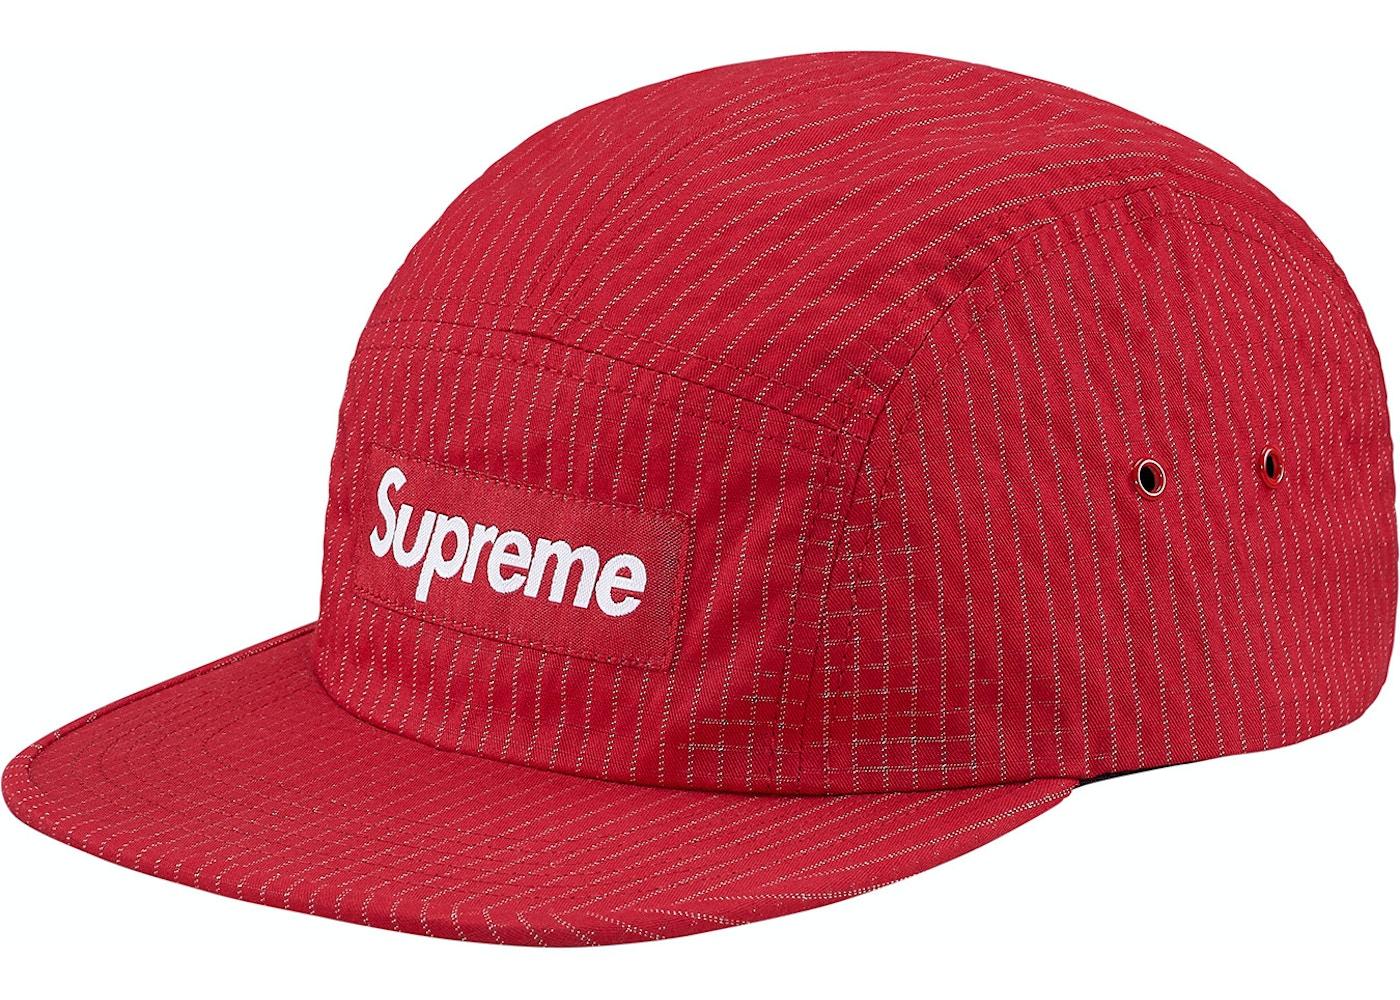 8b04e0272a6 HypeAnalyzer · Supreme Overdyed Ripstop Camp Cap Red